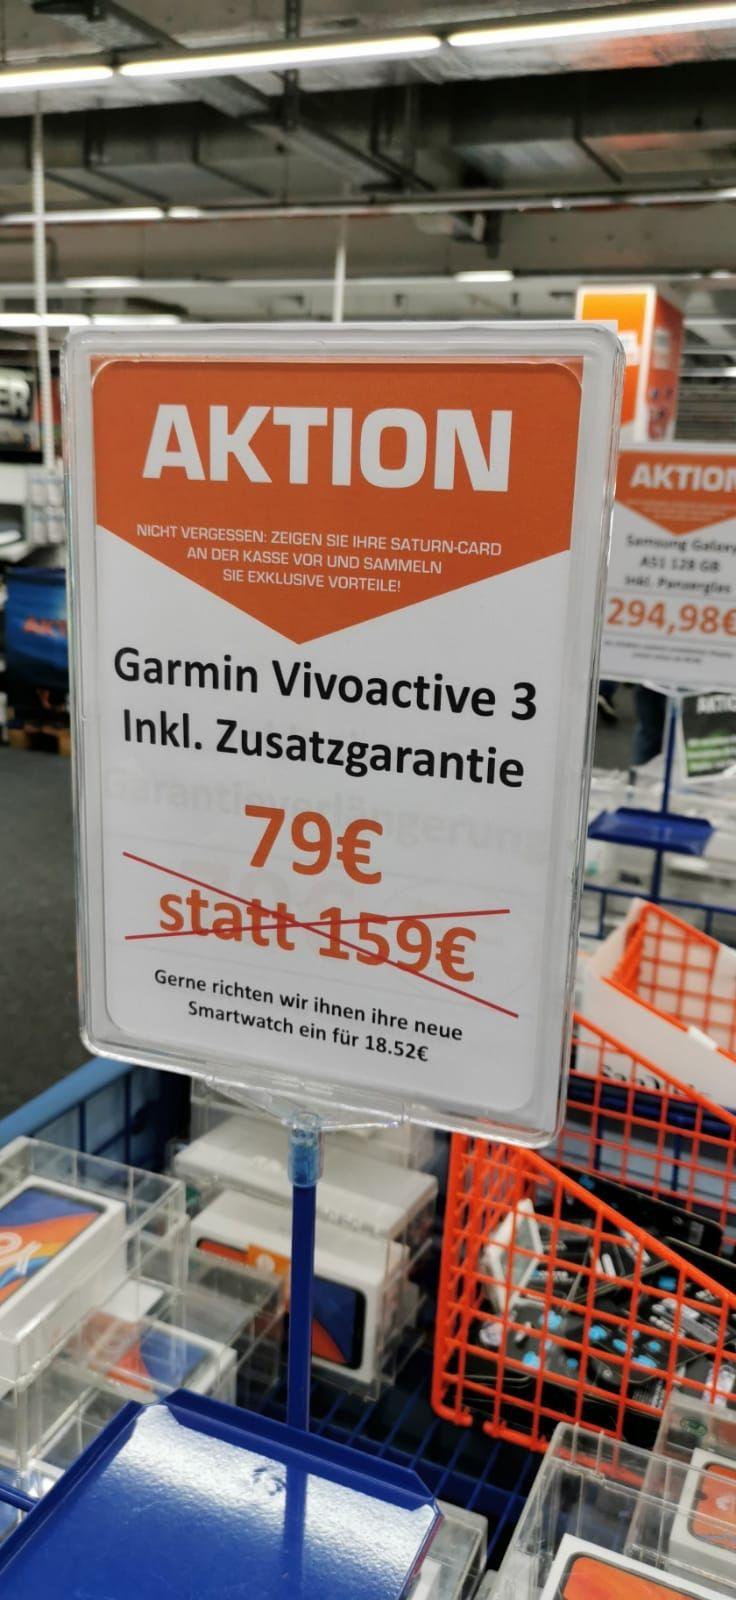 [Lokal - Lünen - Saturn] Garmin vivoactive 3